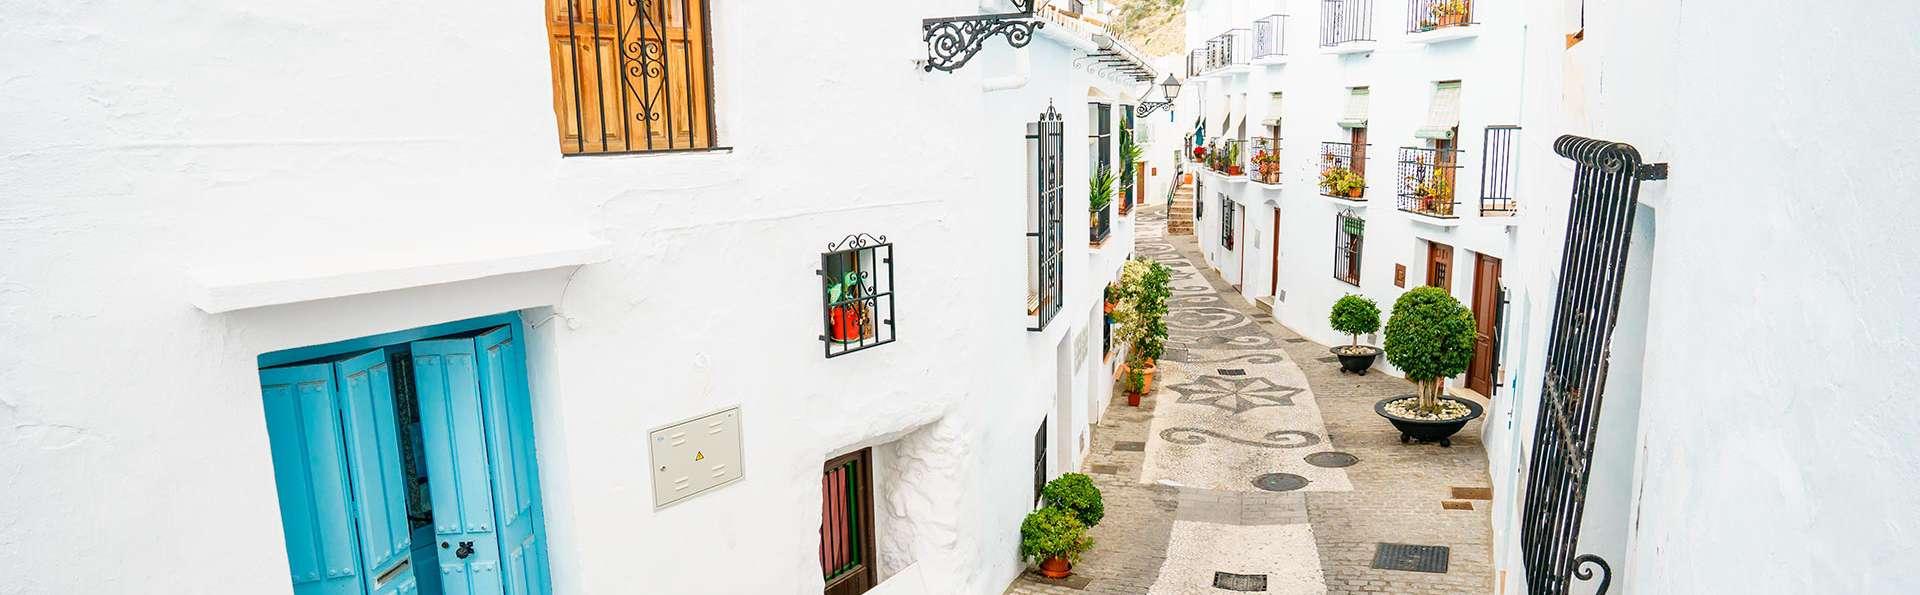 Week-end dans la province de Malaga